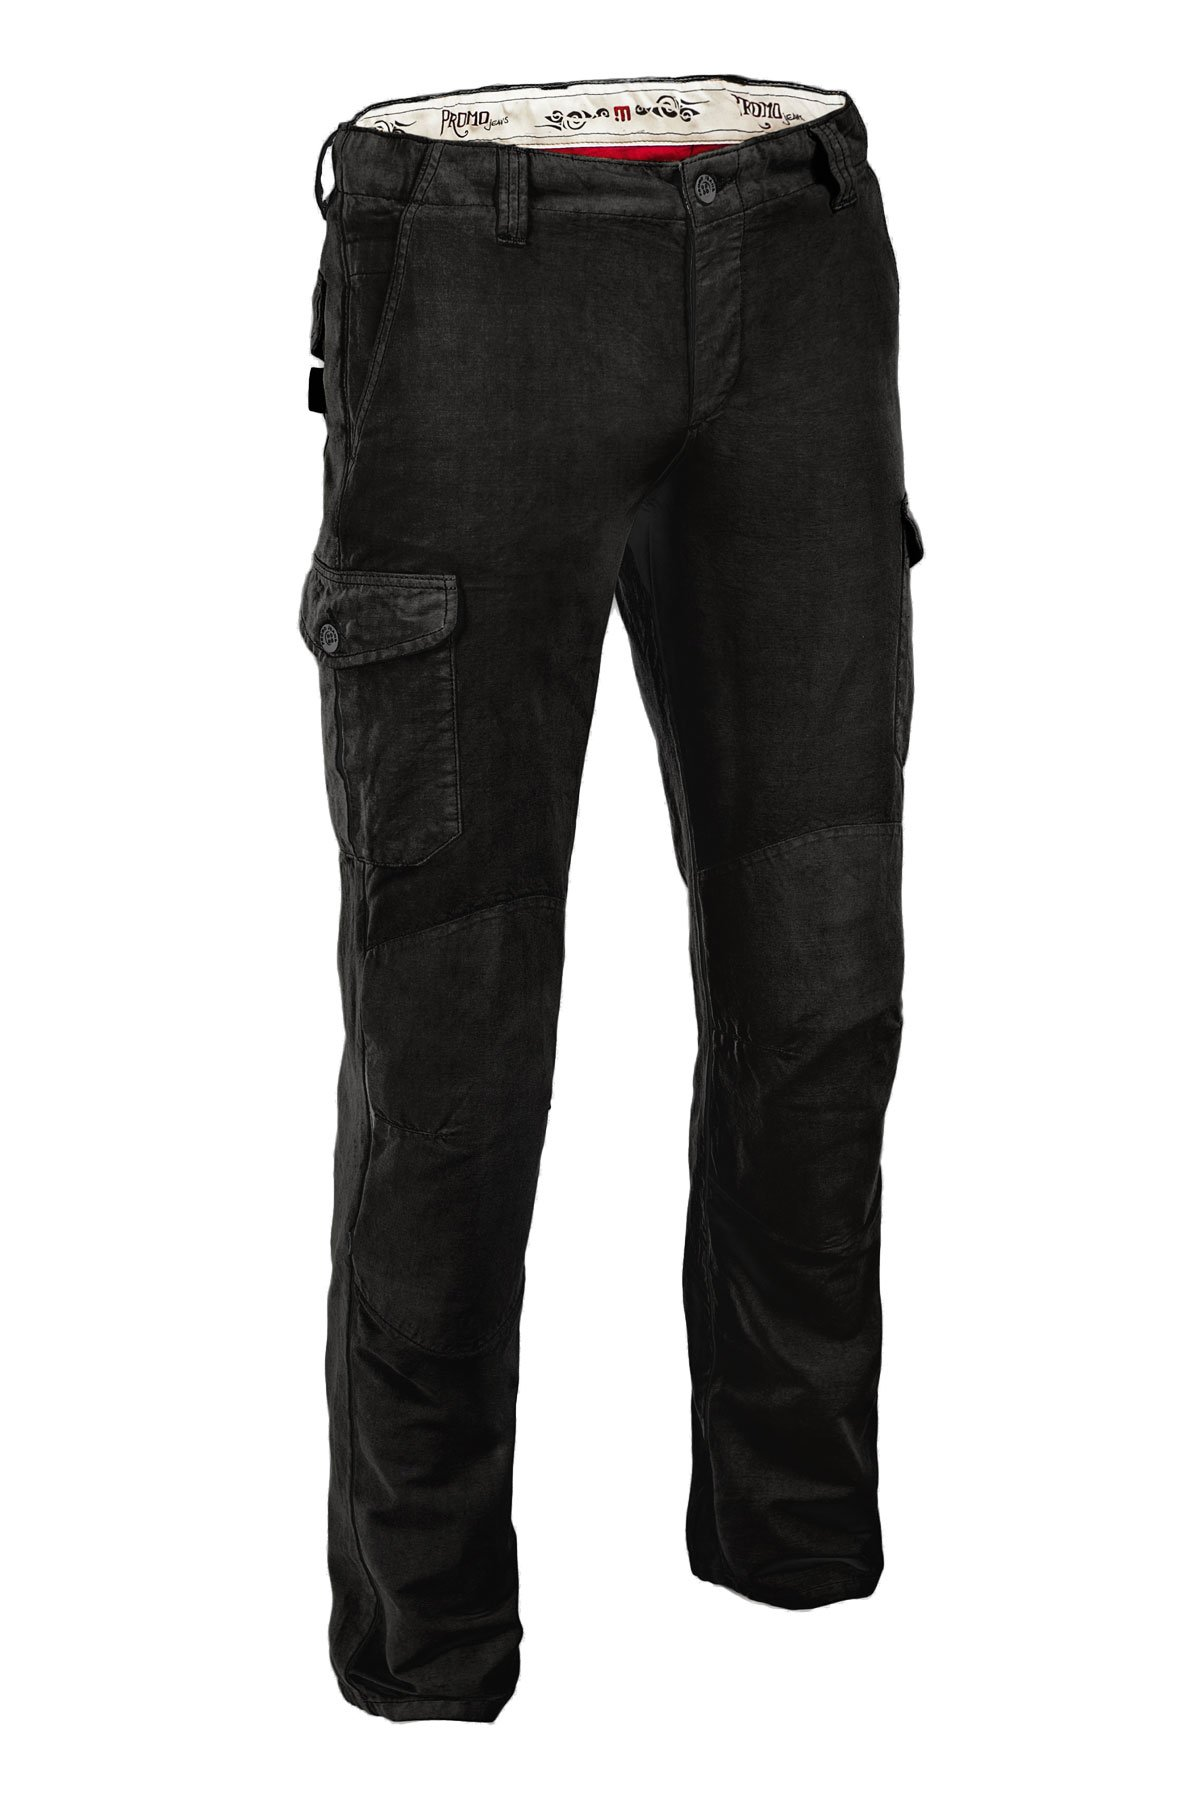 Мотоджинсы Promo Jeans Madison